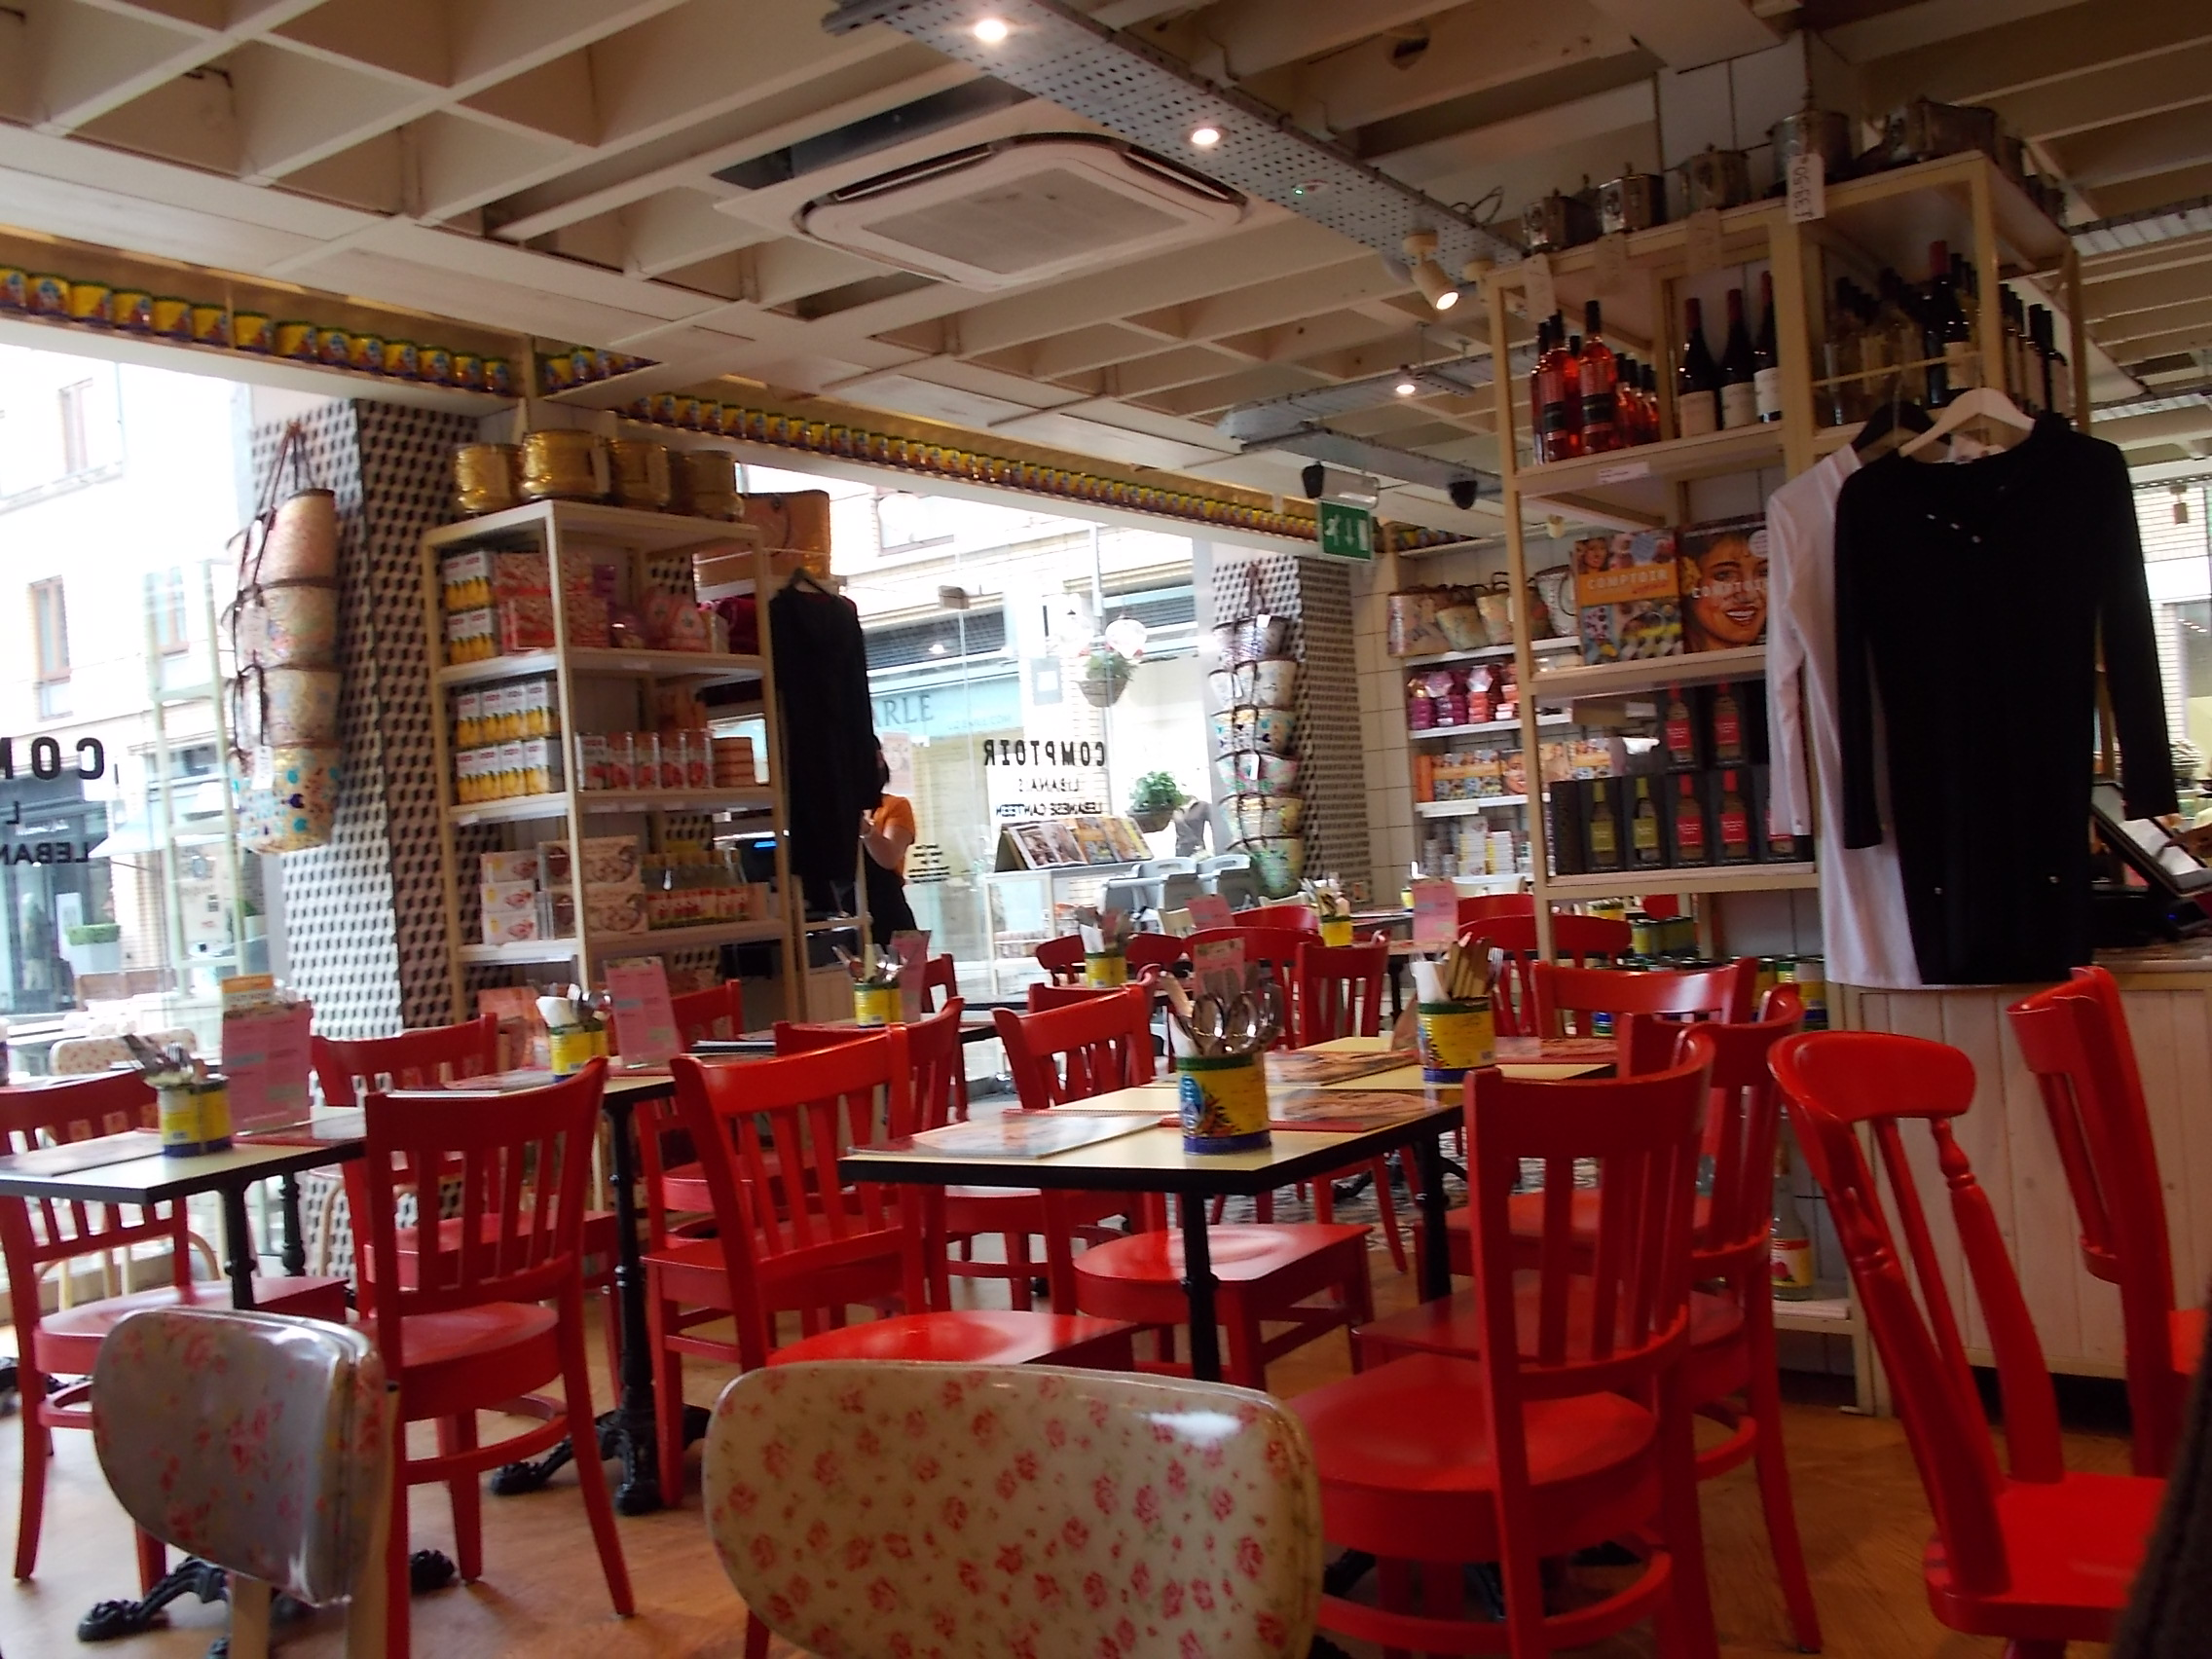 Restaurant review comptoir libanais duke of york square - Comptoir restaurant london ...